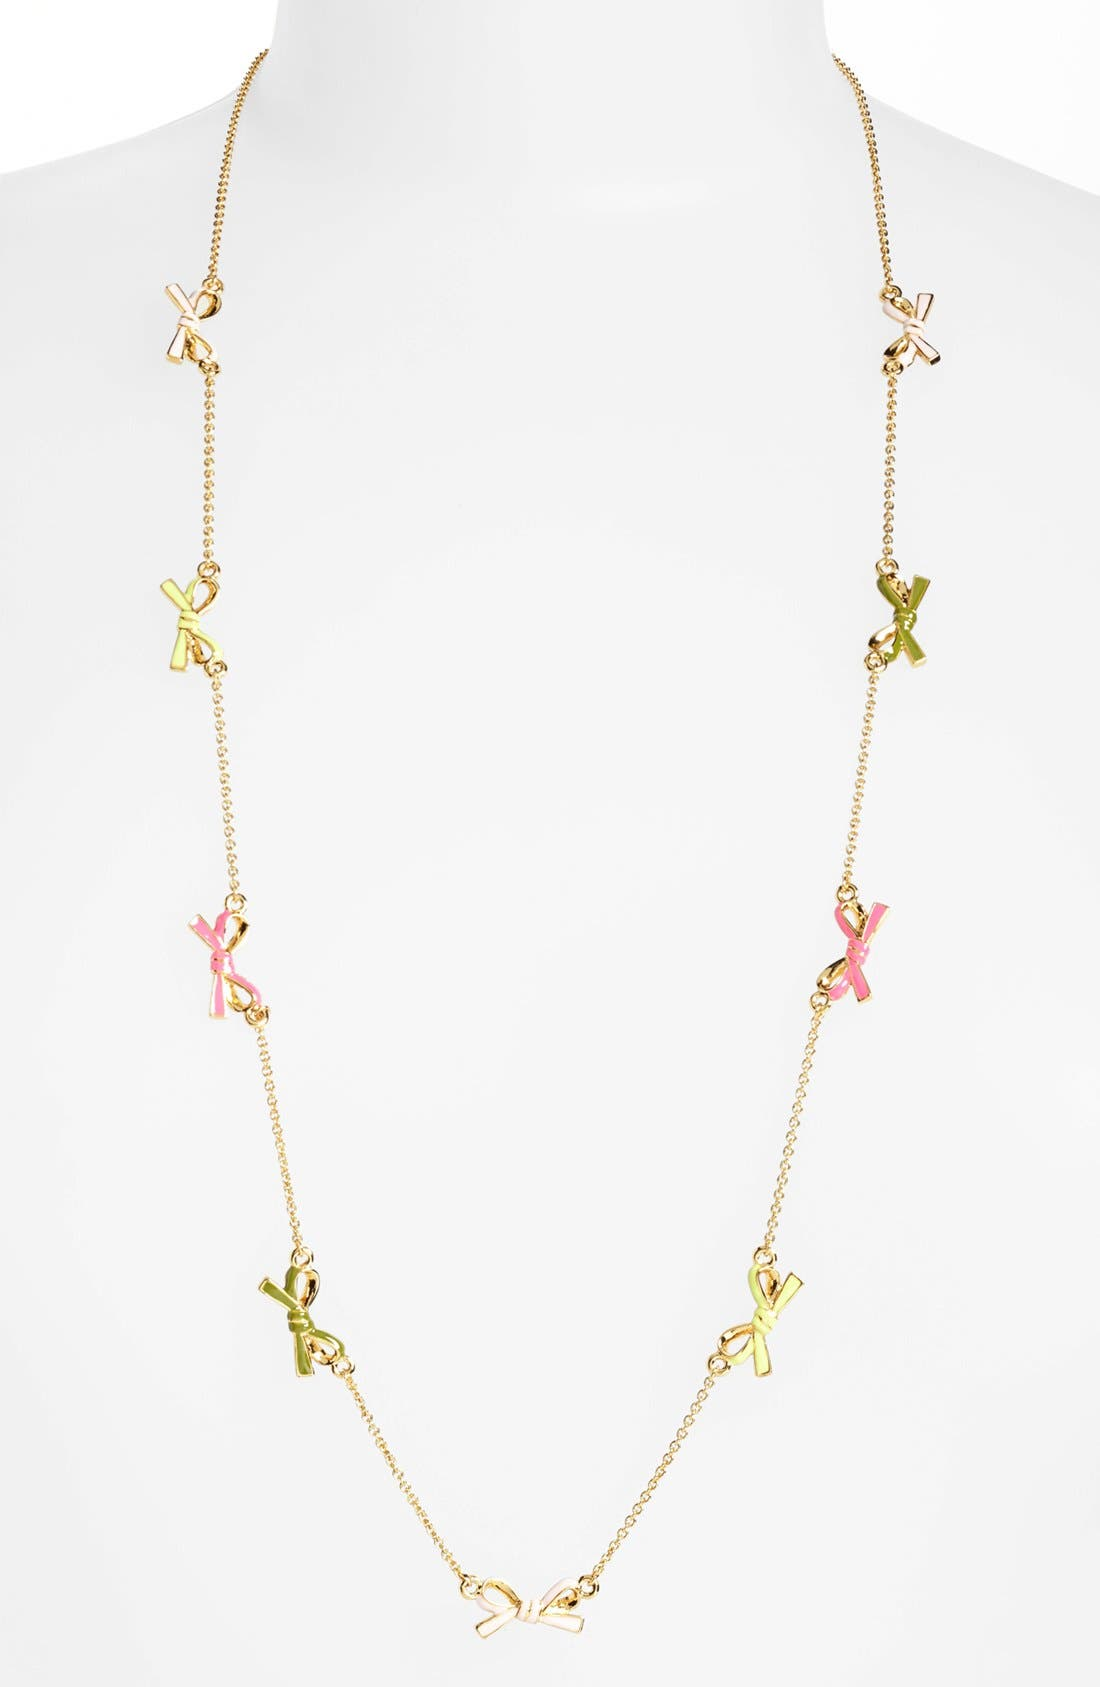 Main Image - kate spade new york 'skinny mini' long station necklace